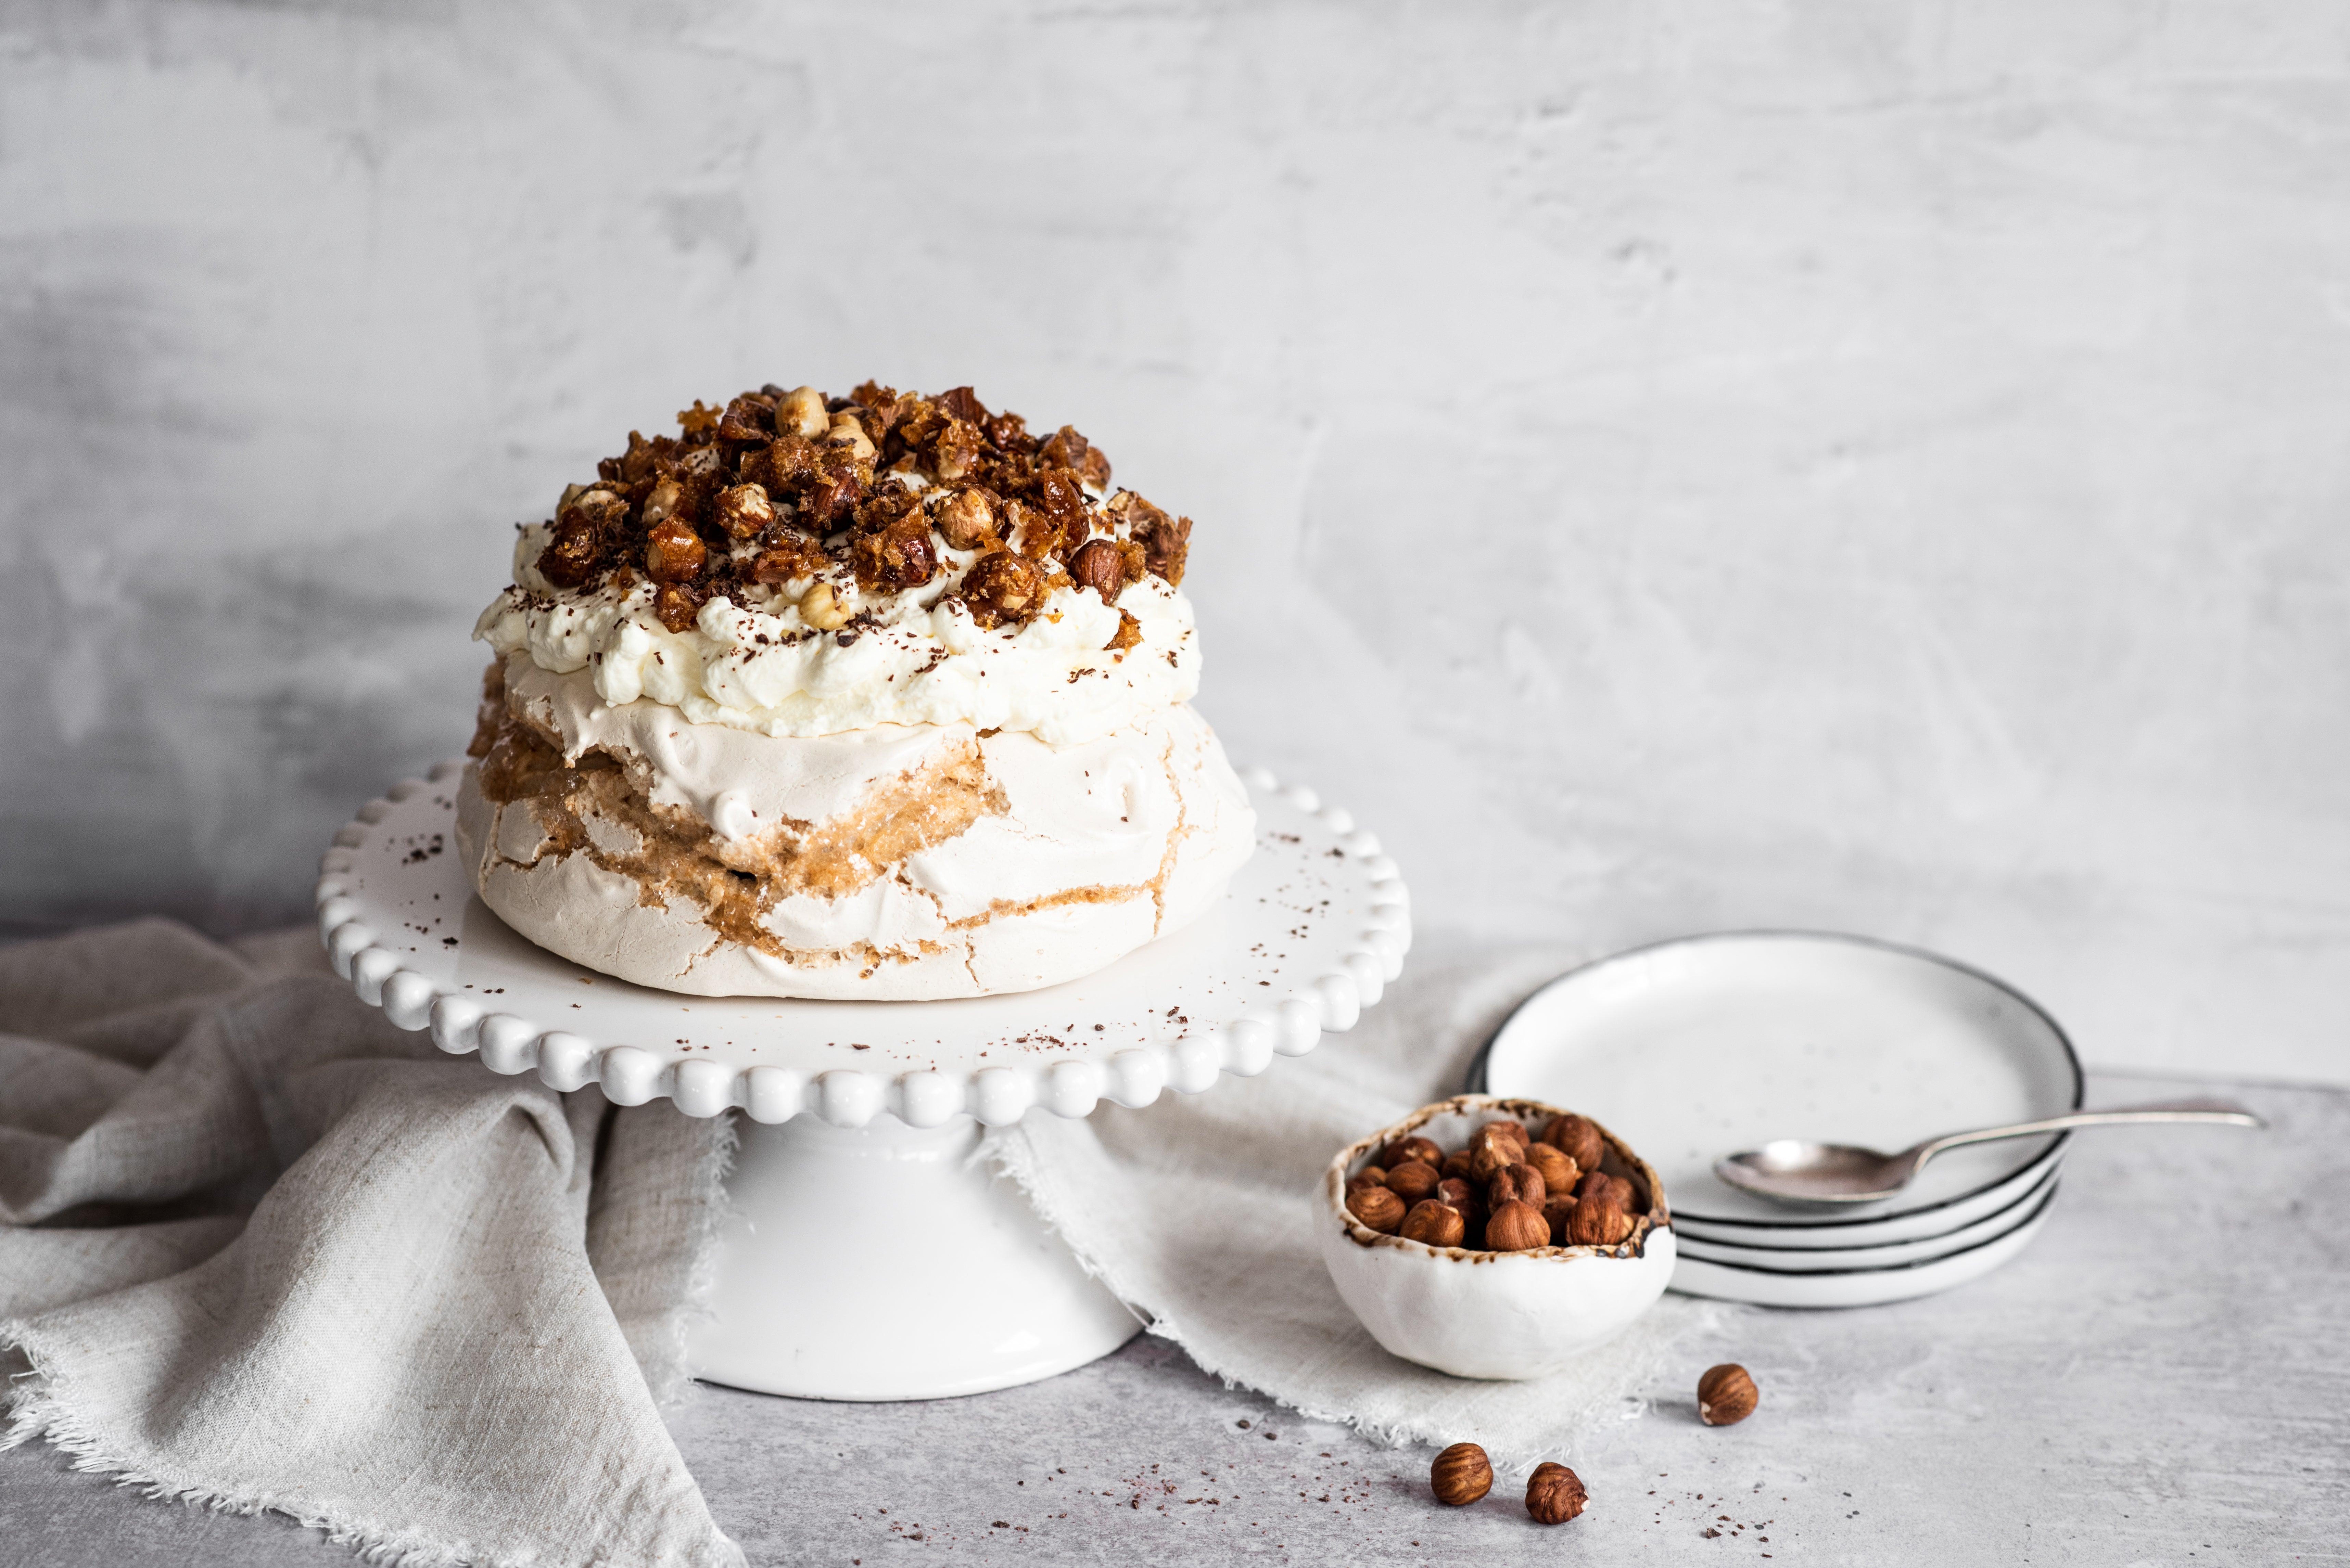 Coffee roasted hazelnut meringue on stand topped with hazelnuts next to a bowl of hazelnuts